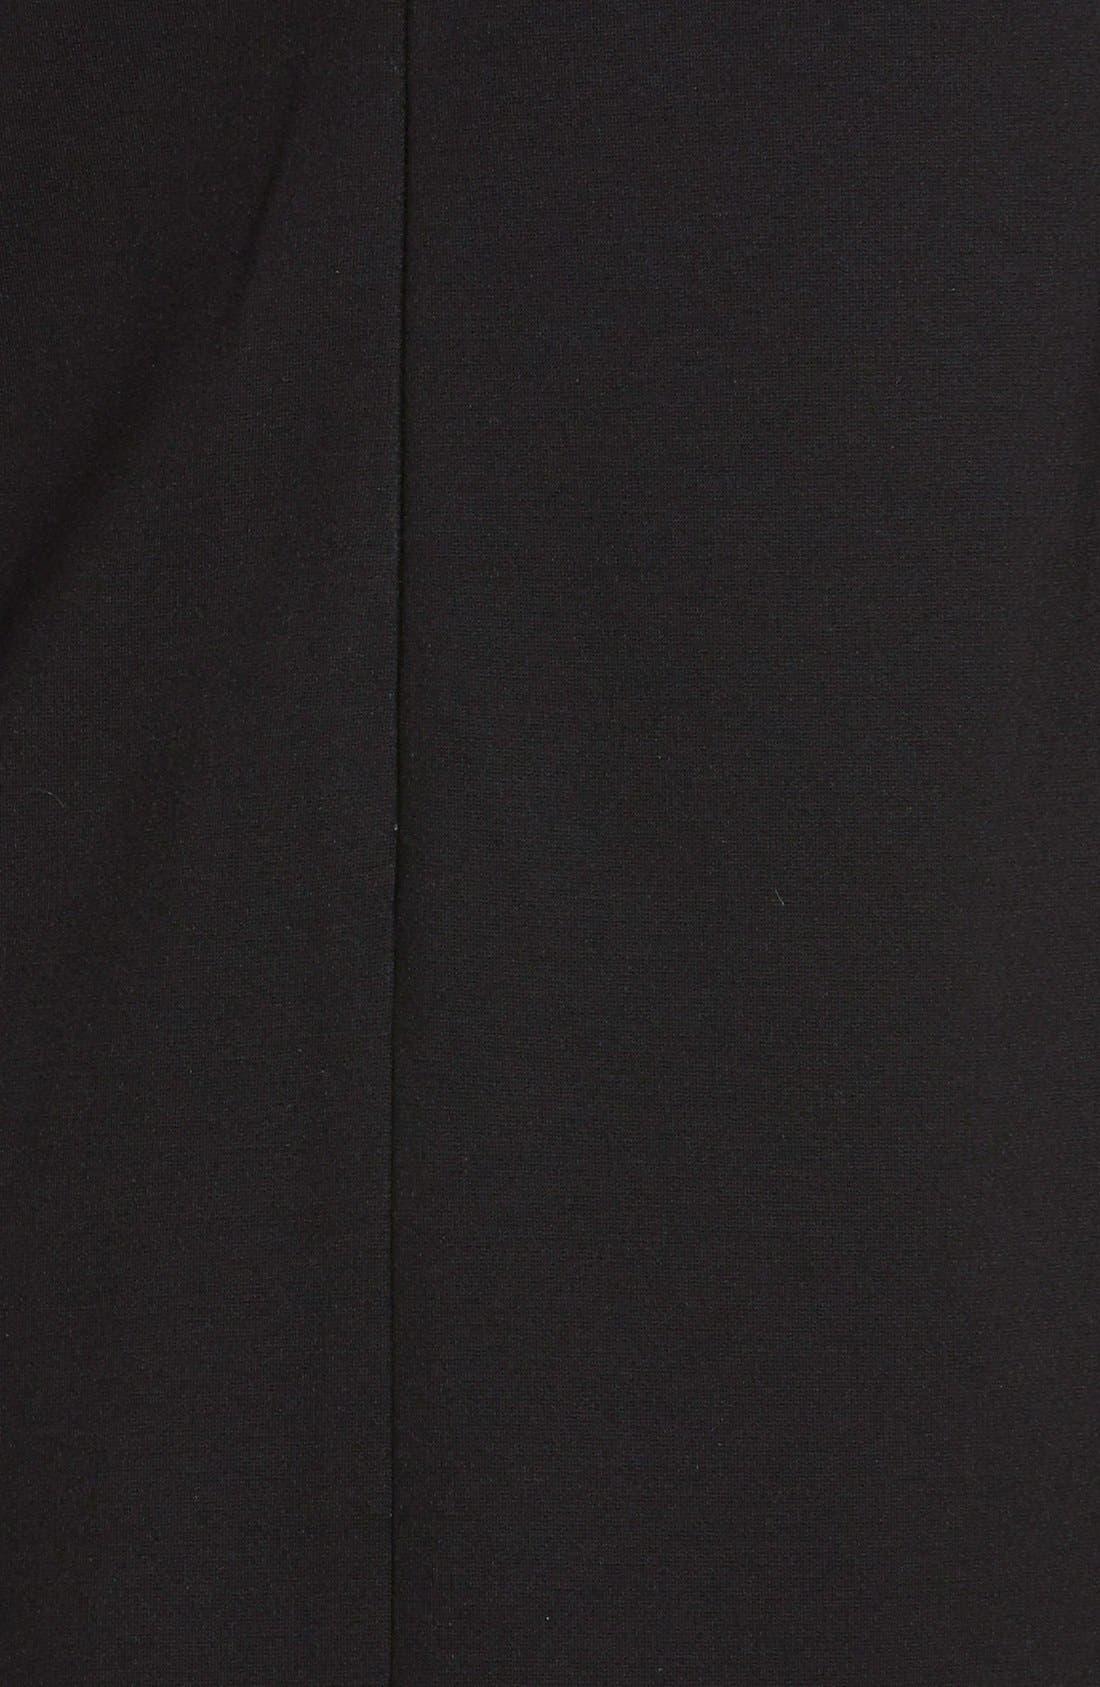 Alternate Image 3  - Cynthia Steffe Collared Ponte Knit Shift Dress